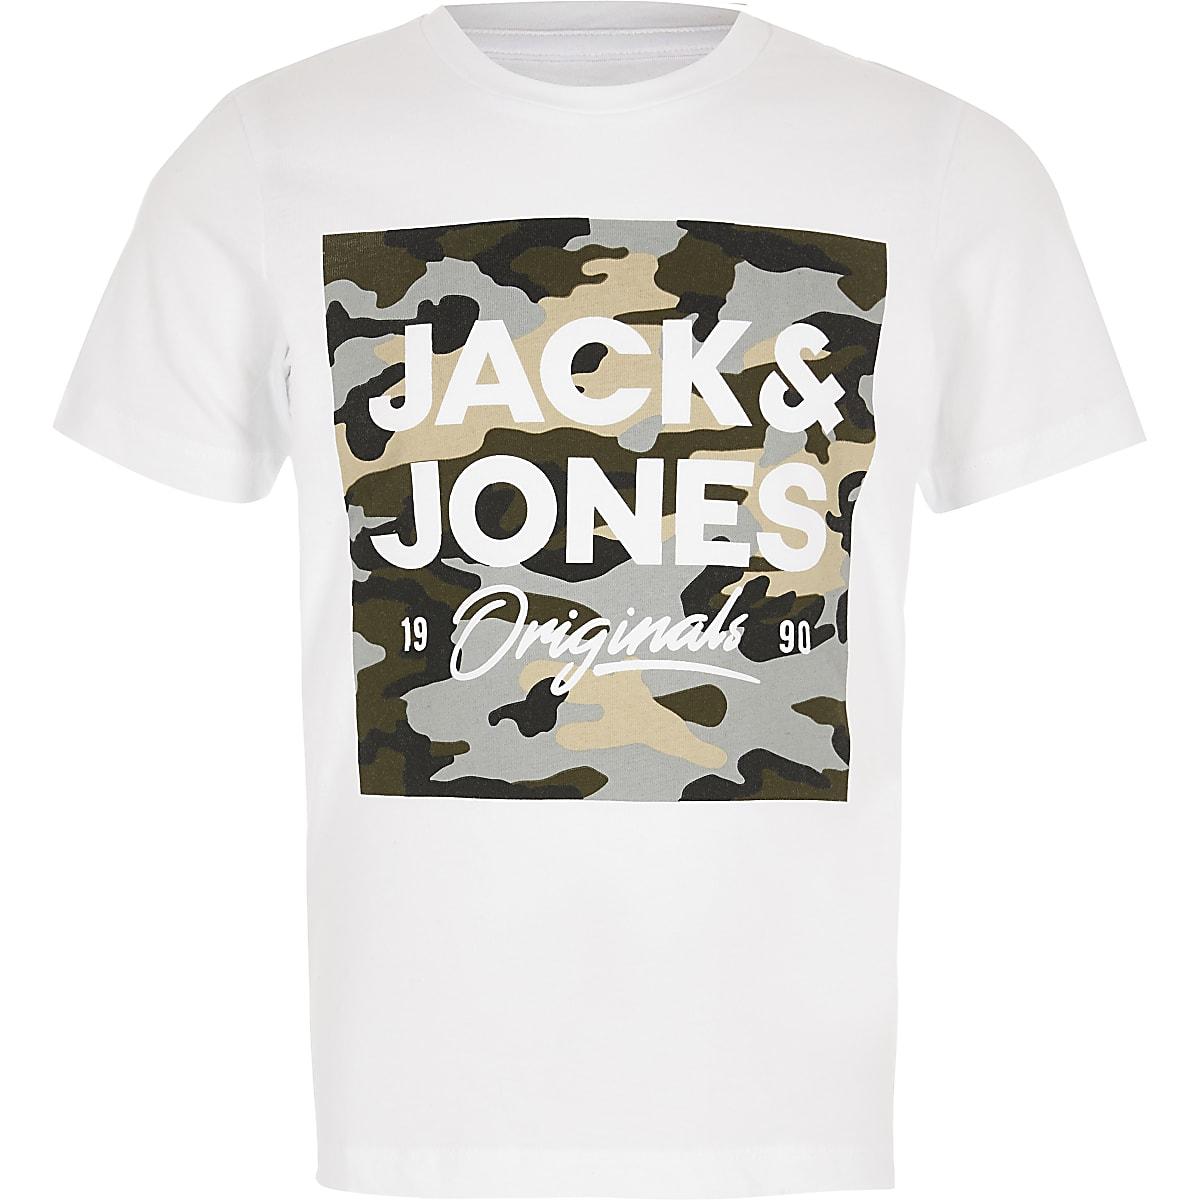 Boys Jack and Jones white camo logo T-shirt